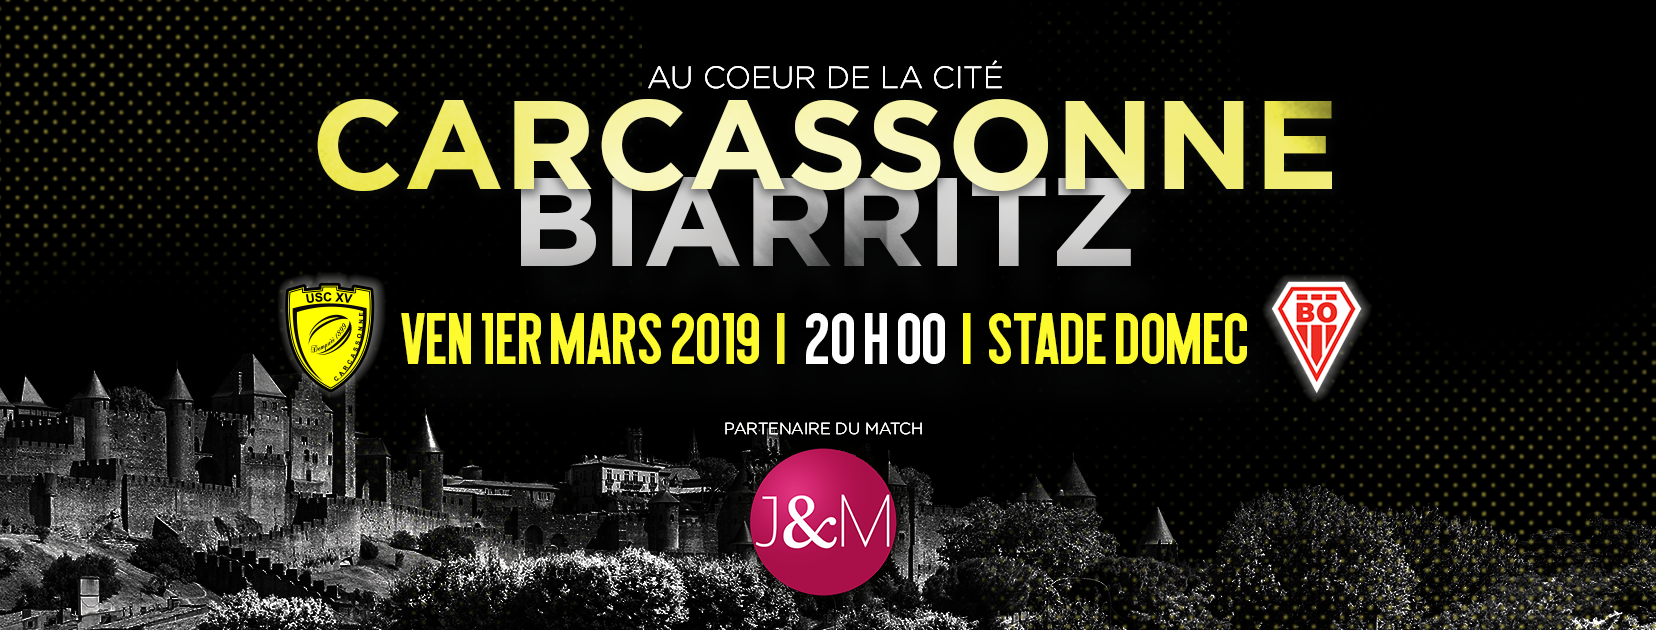 Billetterie carcassonne